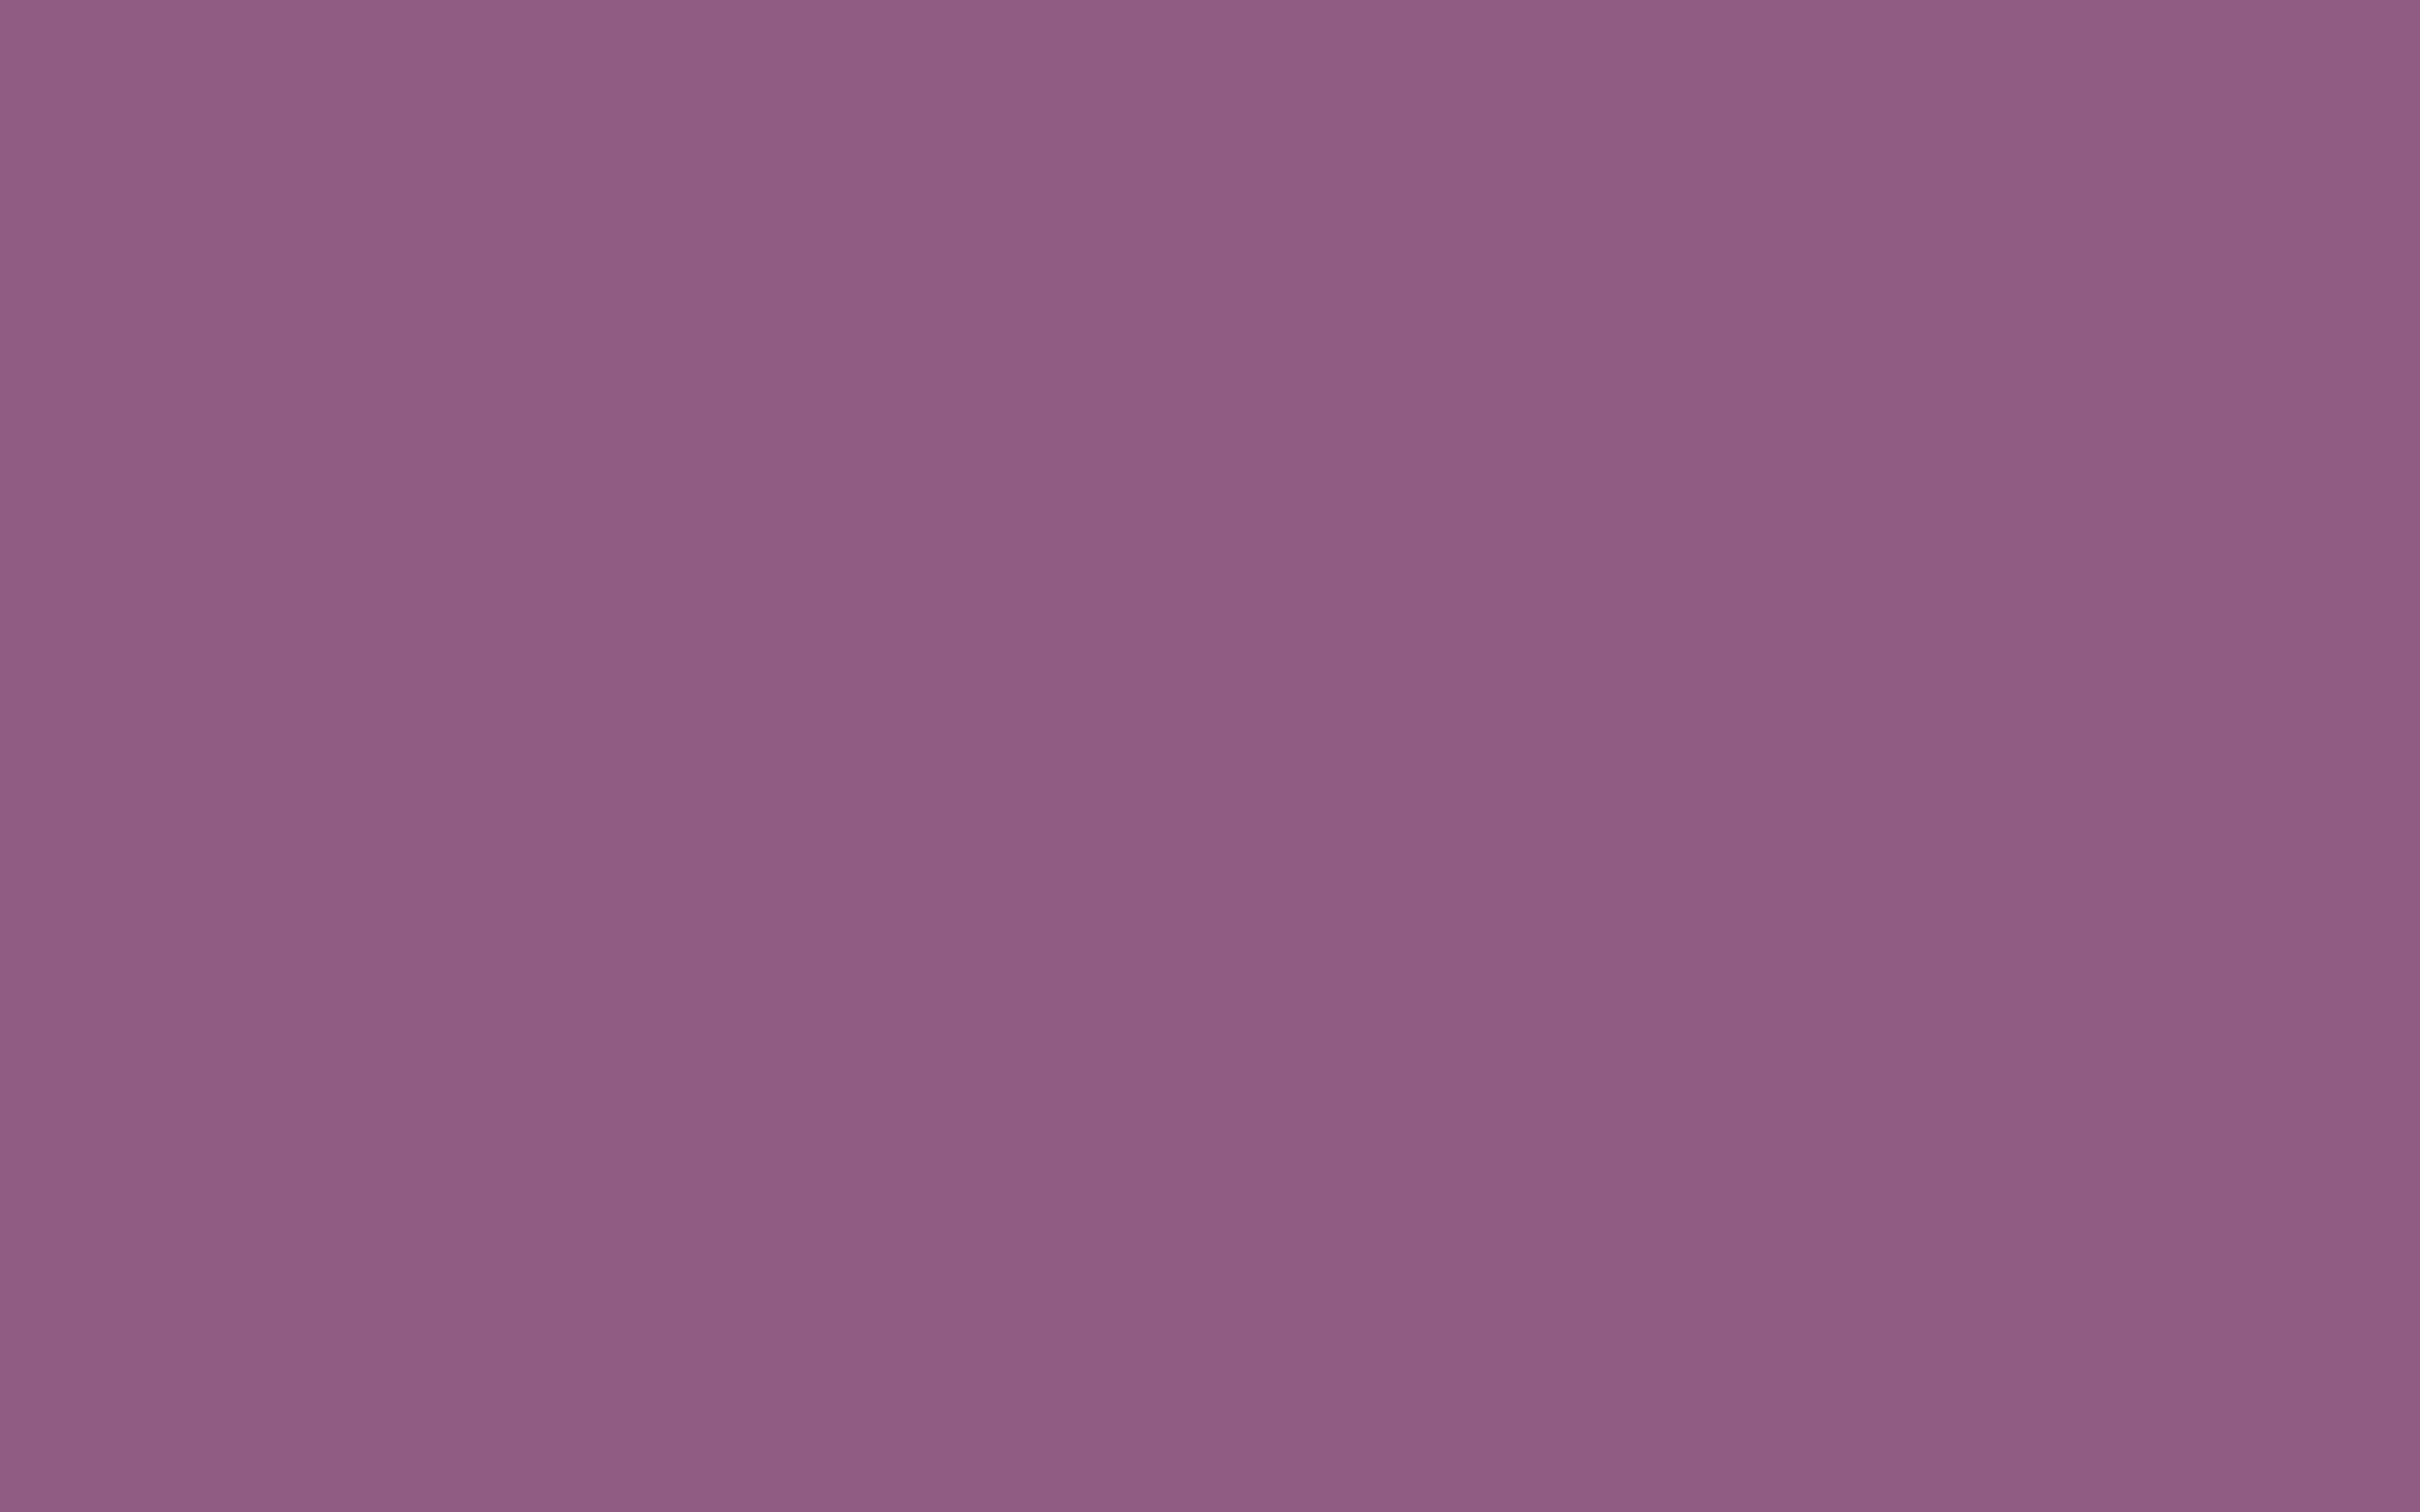 2560x1600 Antique Fuchsia Solid Color Background